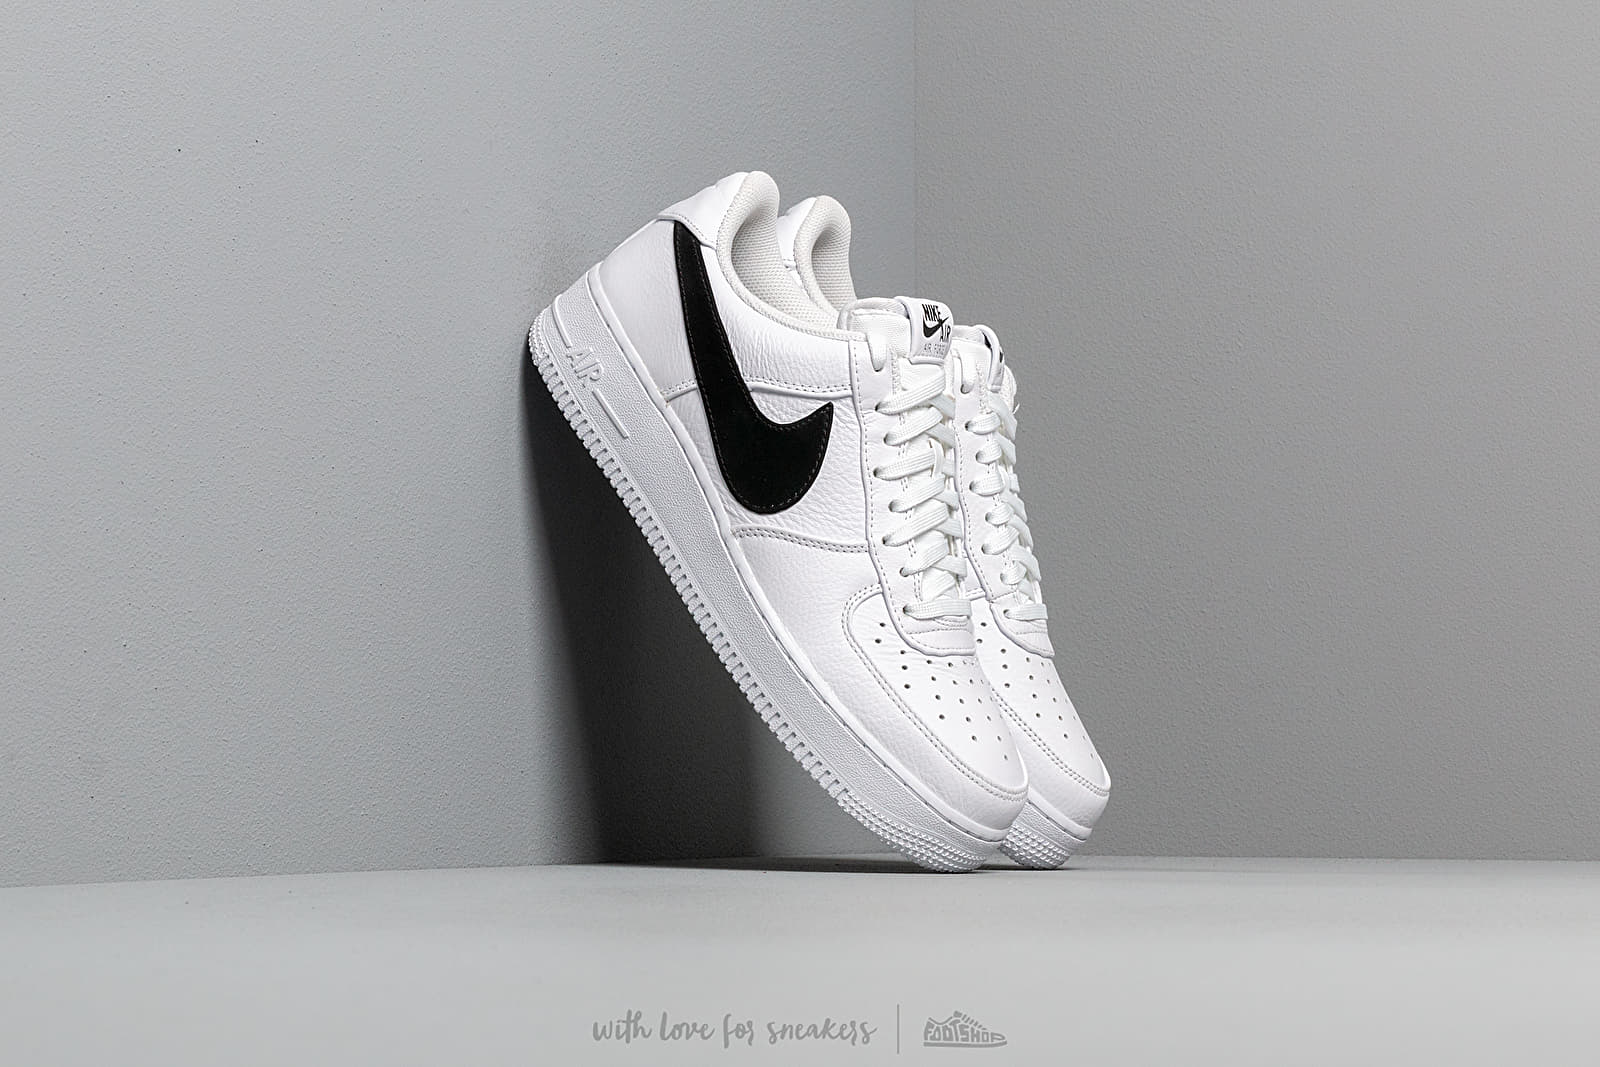 Nike Air Force 1 '07 Premium 2 White/ Black za skvělou cenu 3 290 Kč koupíte na Footshop.cz